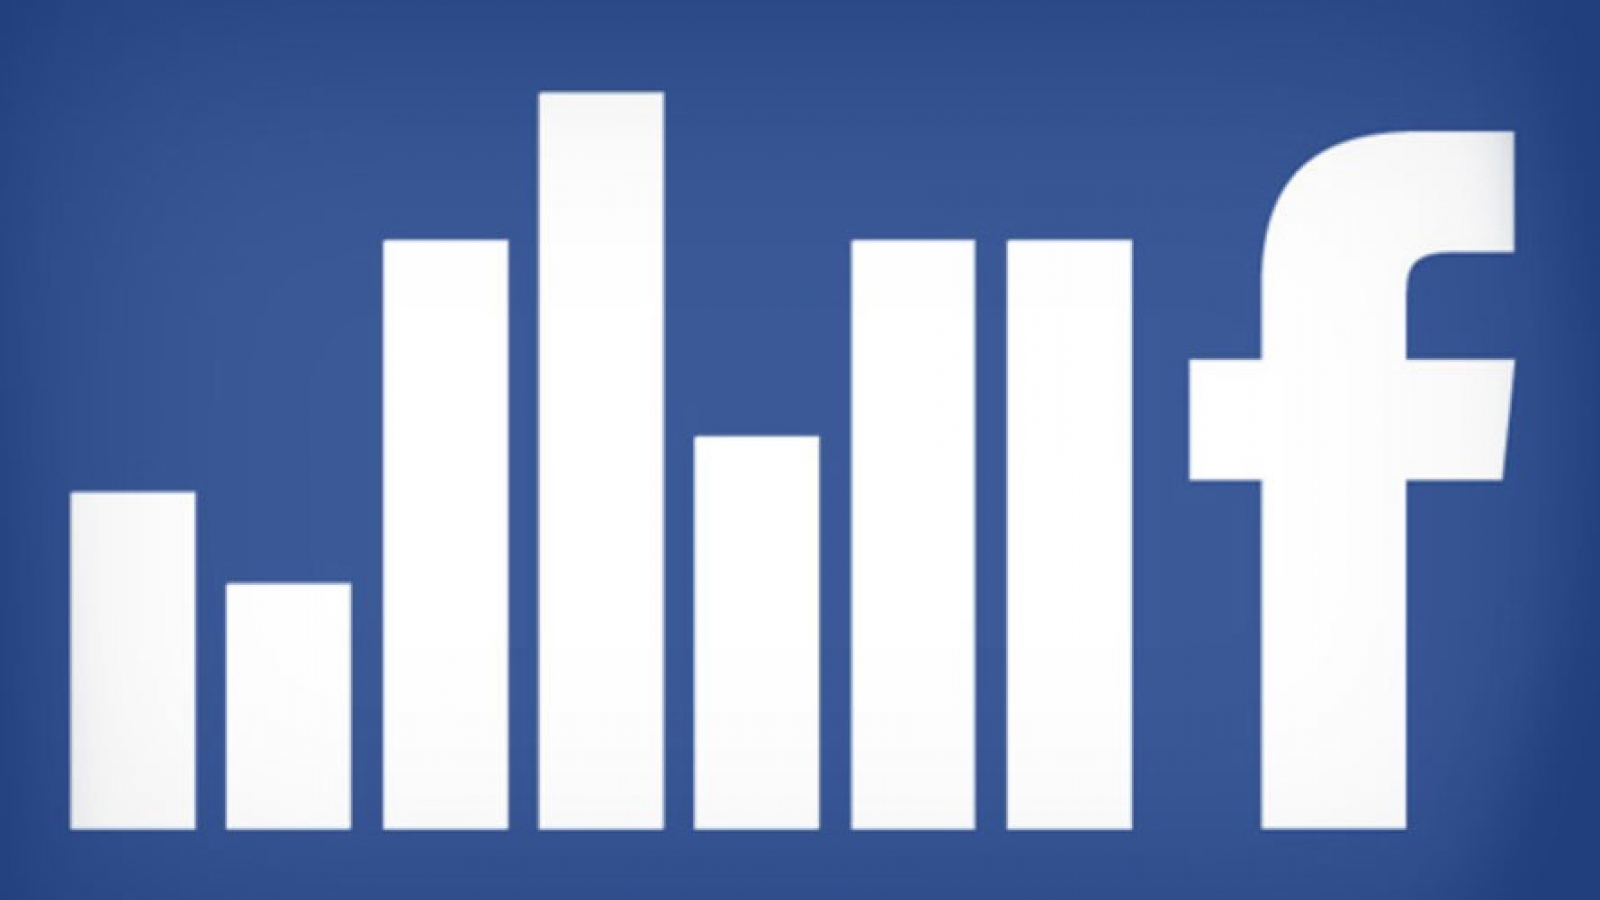 fb-graph